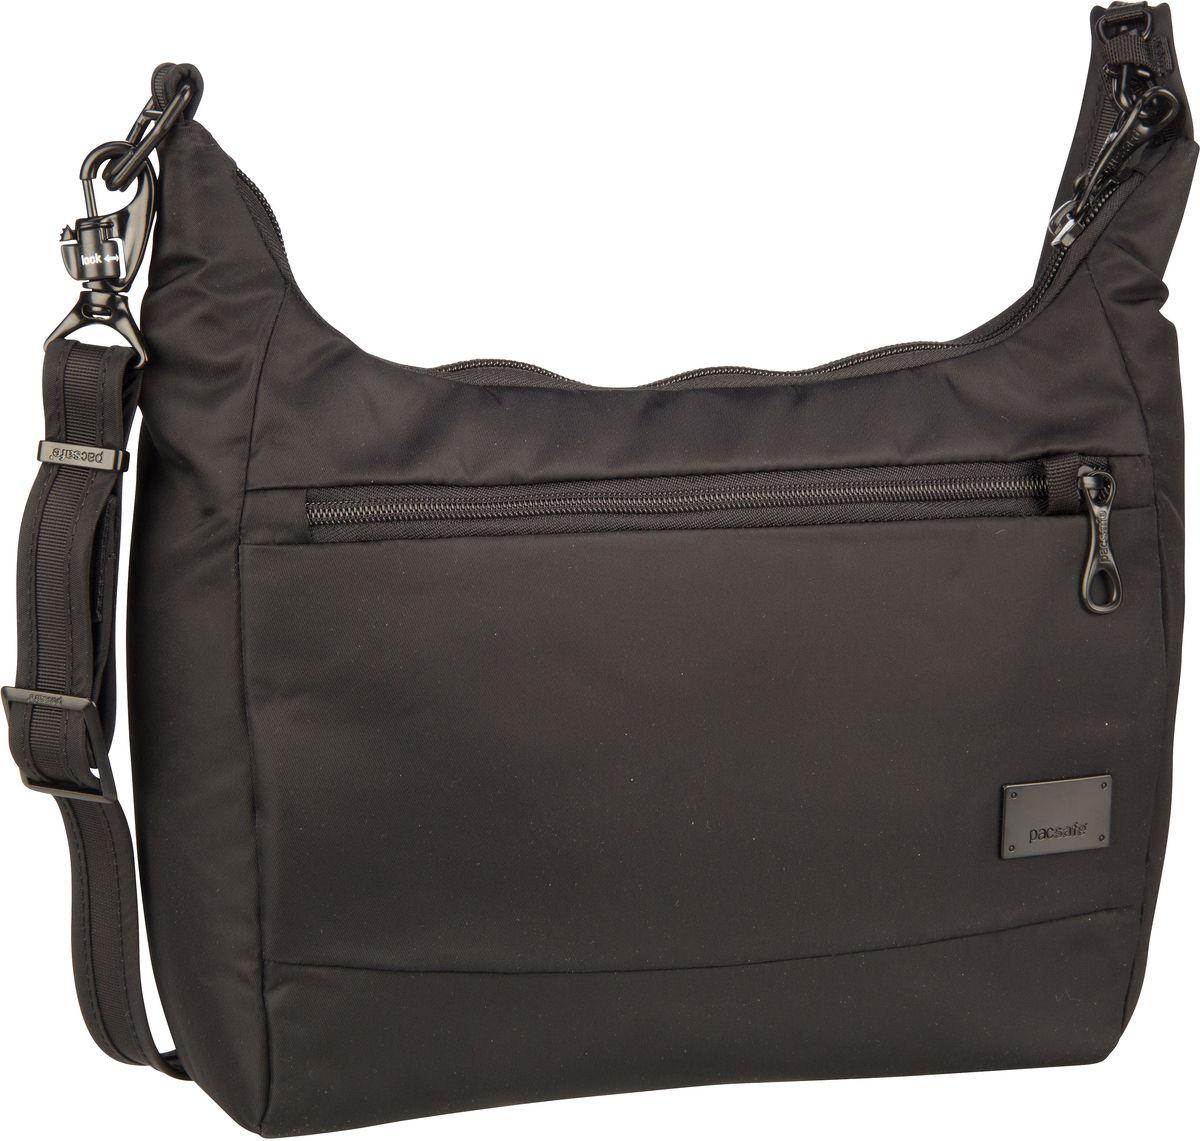 Pacsafe Umhängetasche Stylesafe CS100 Handbag Black (5 Liter)